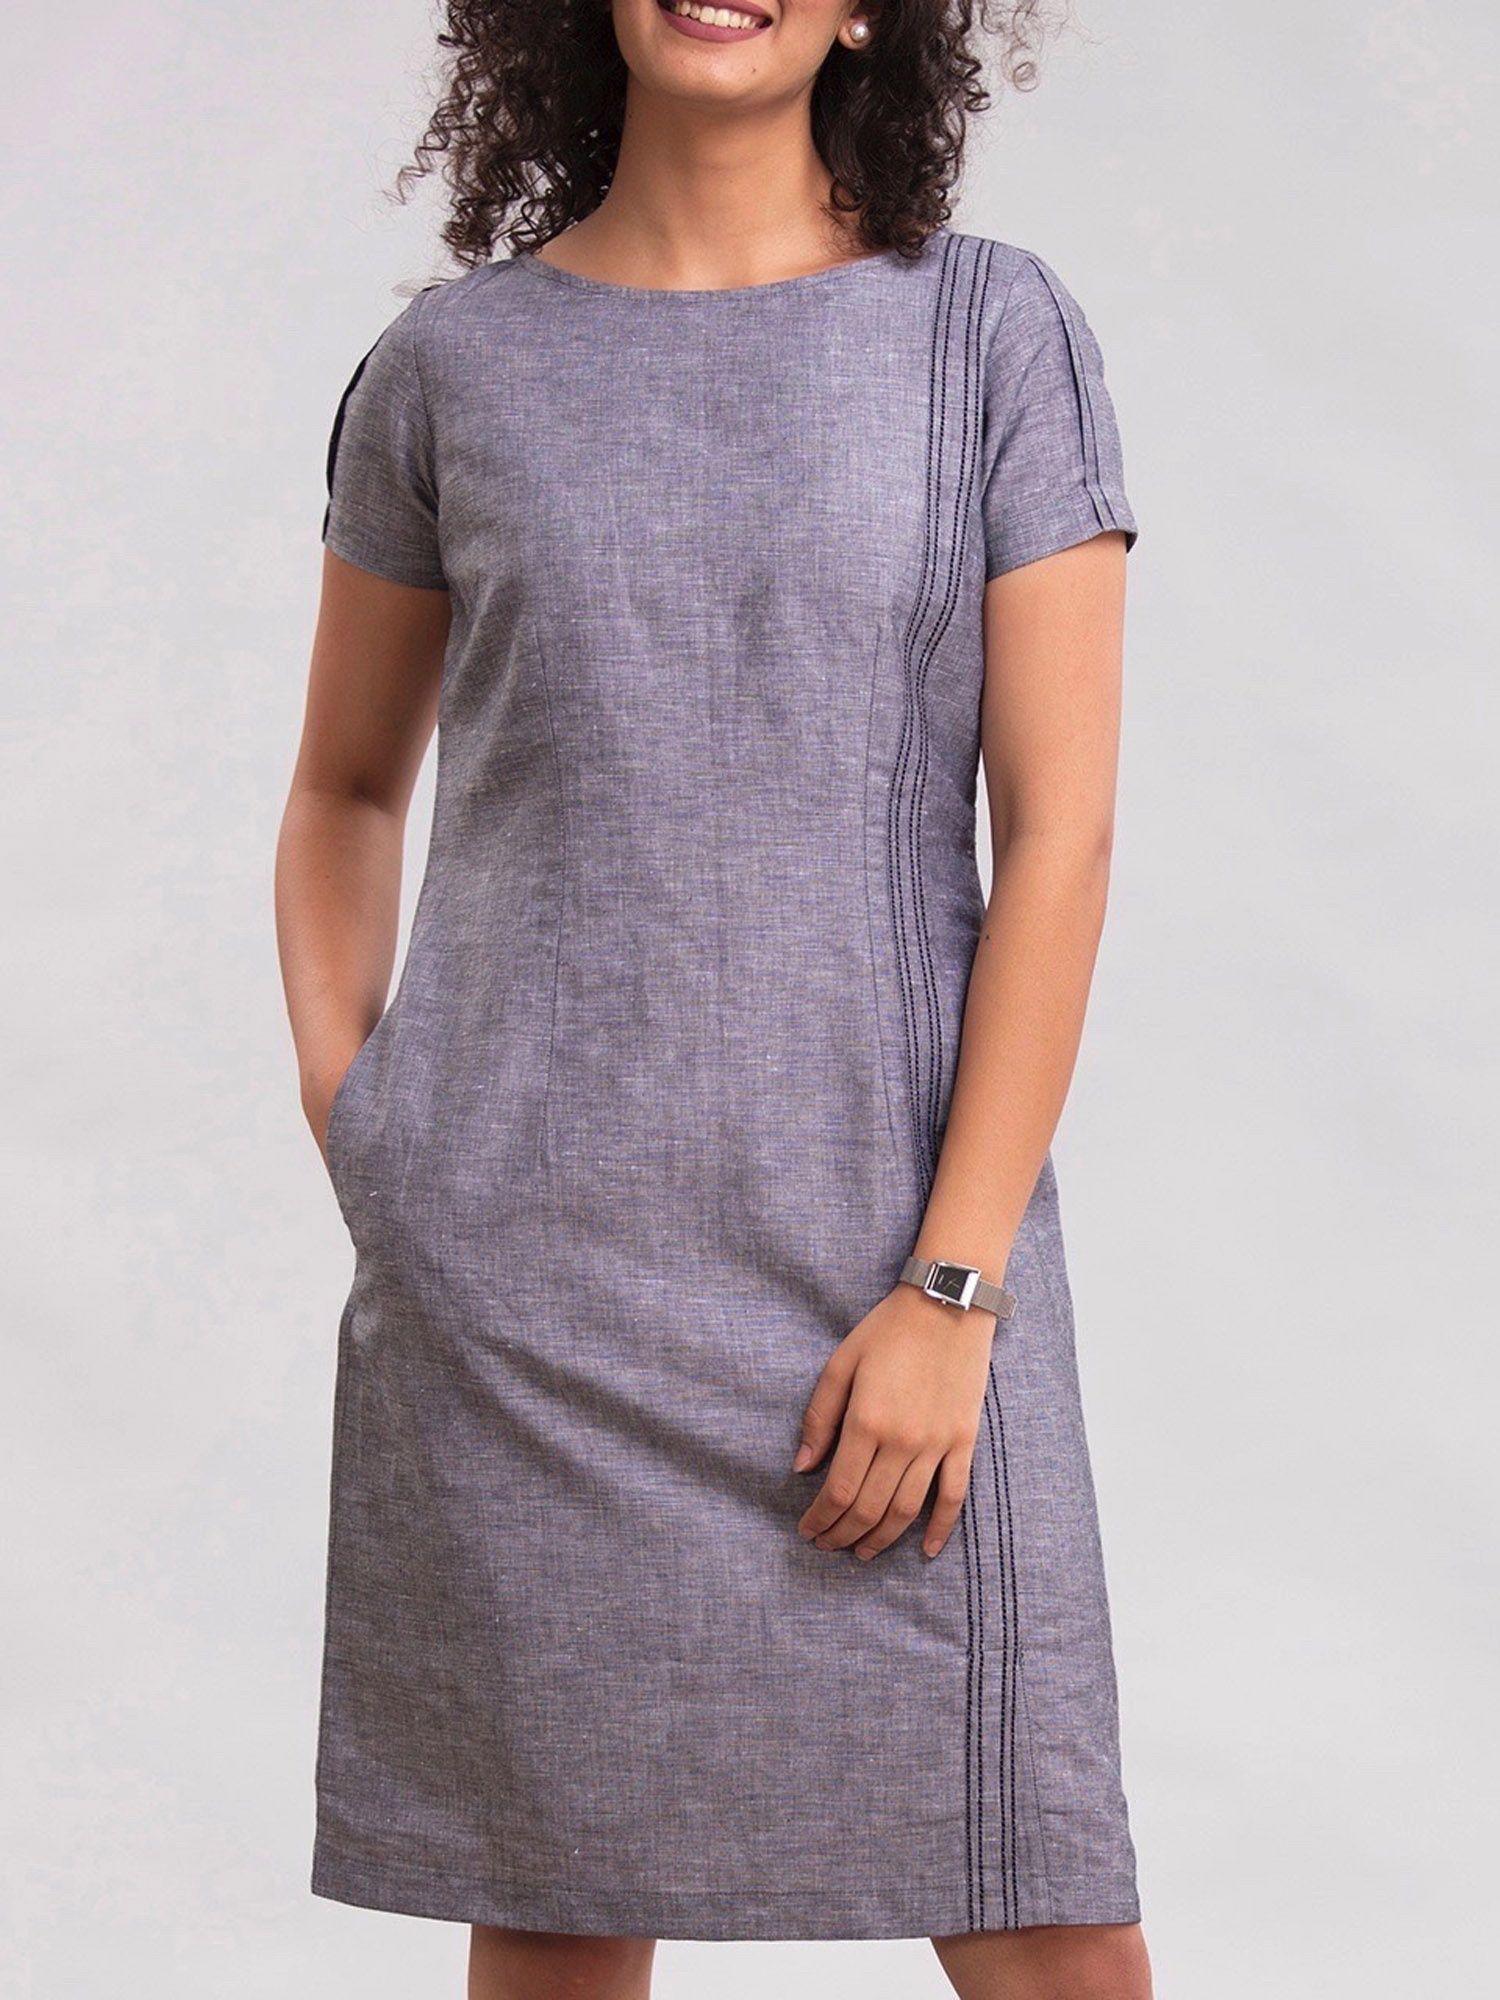 7cd1d6812d FableStreet Dresses   Buy FableStreet Linen Shift Dress - Blue ...